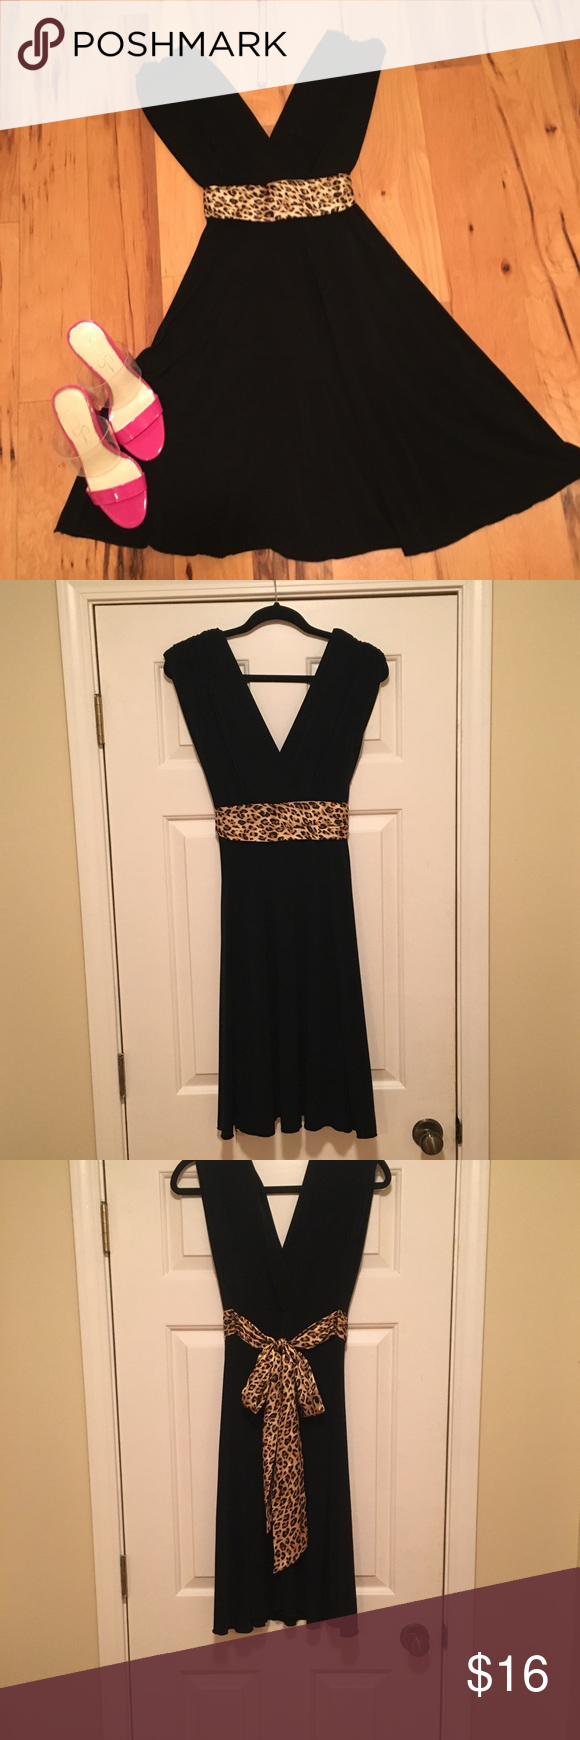 Roulette Black Dress With Leopard Tie At Waist Black Dress Dresses Night Dress [ 1740 x 580 Pixel ]